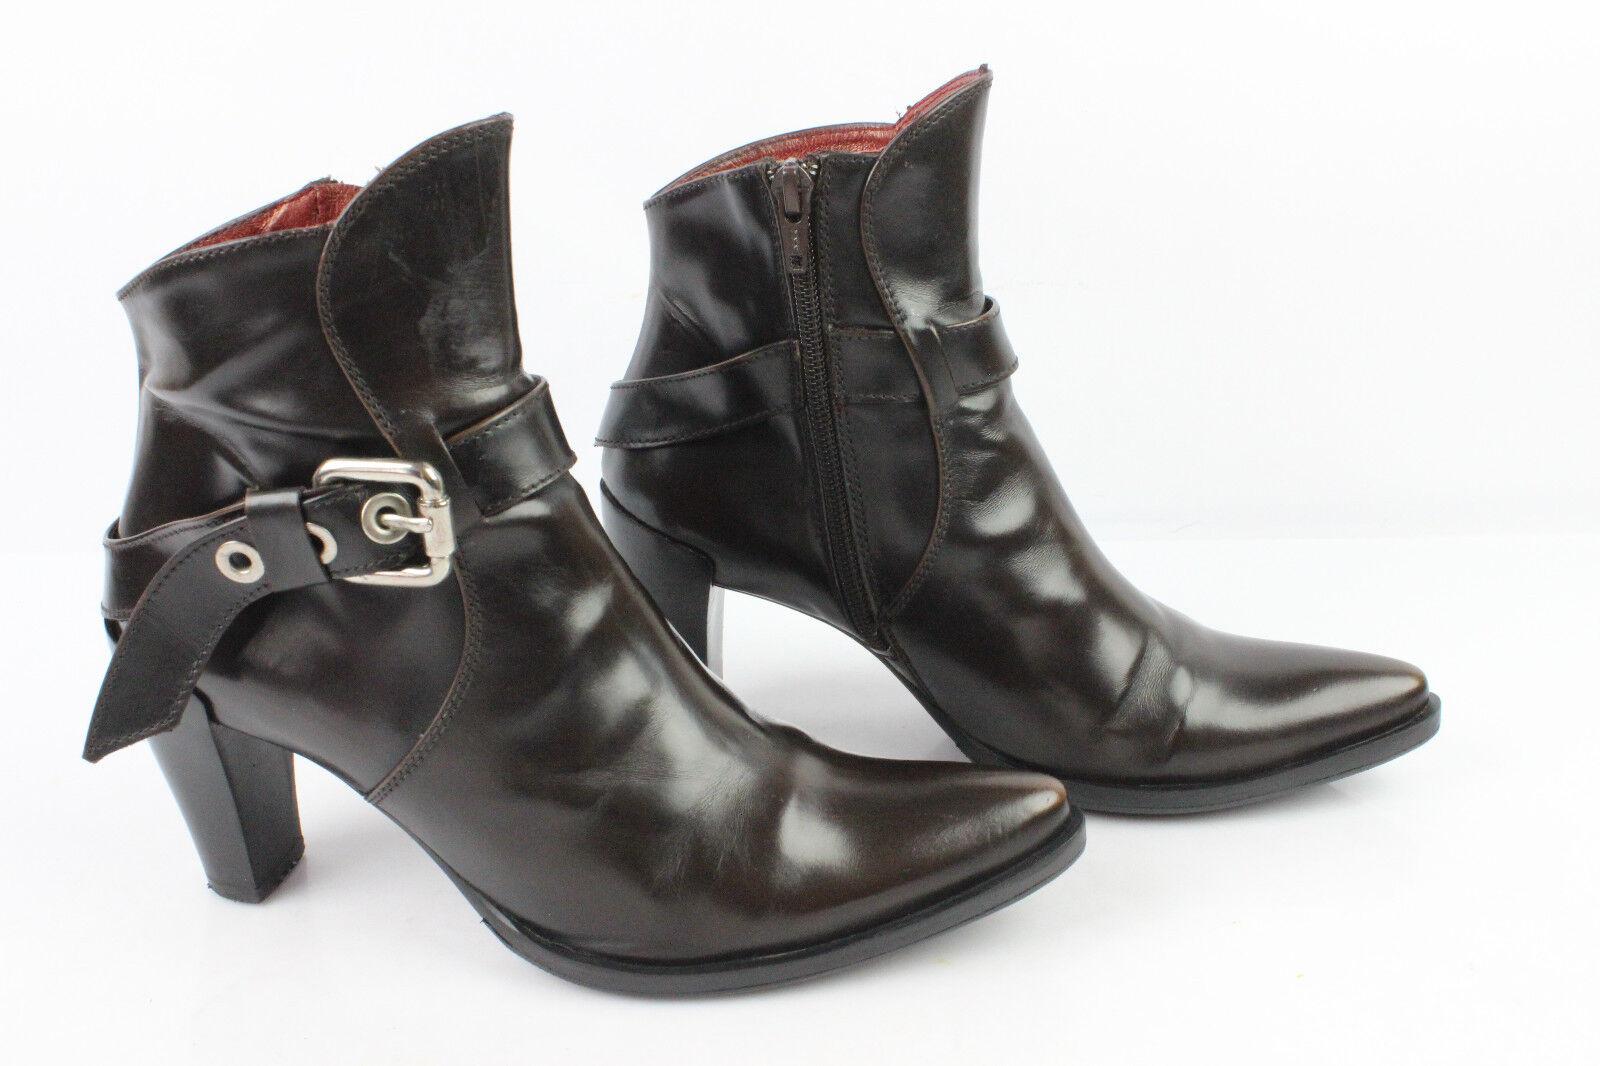 Bottines Boots MURATTI Tout Cuir Glacé brown T 36,5 TRES BON ETAT